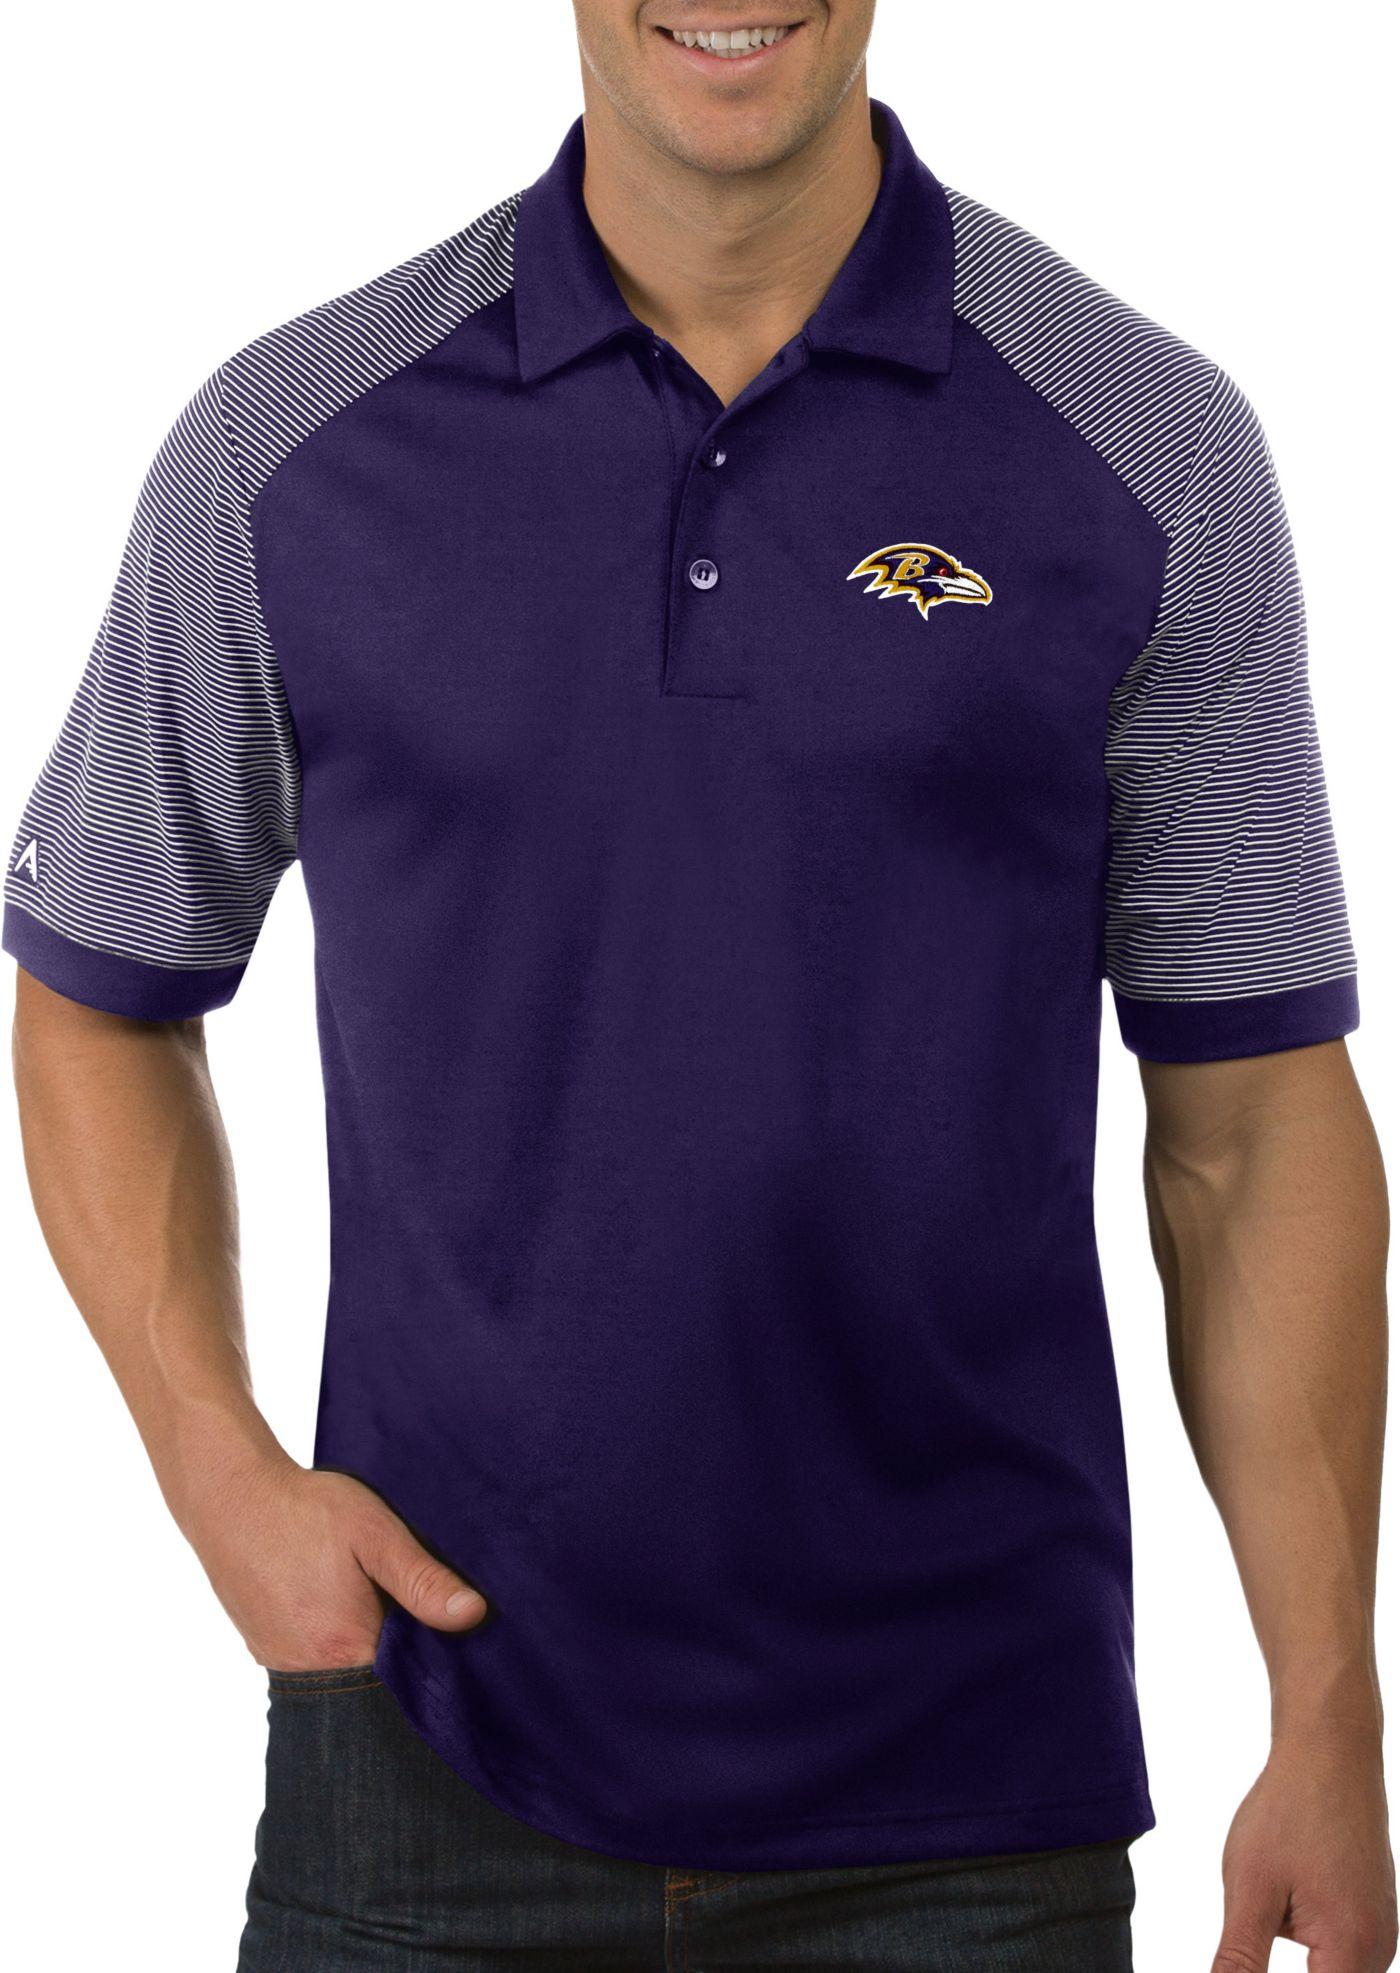 Antigua Men's Baltimore Ravens Engage Purple Performance Polo